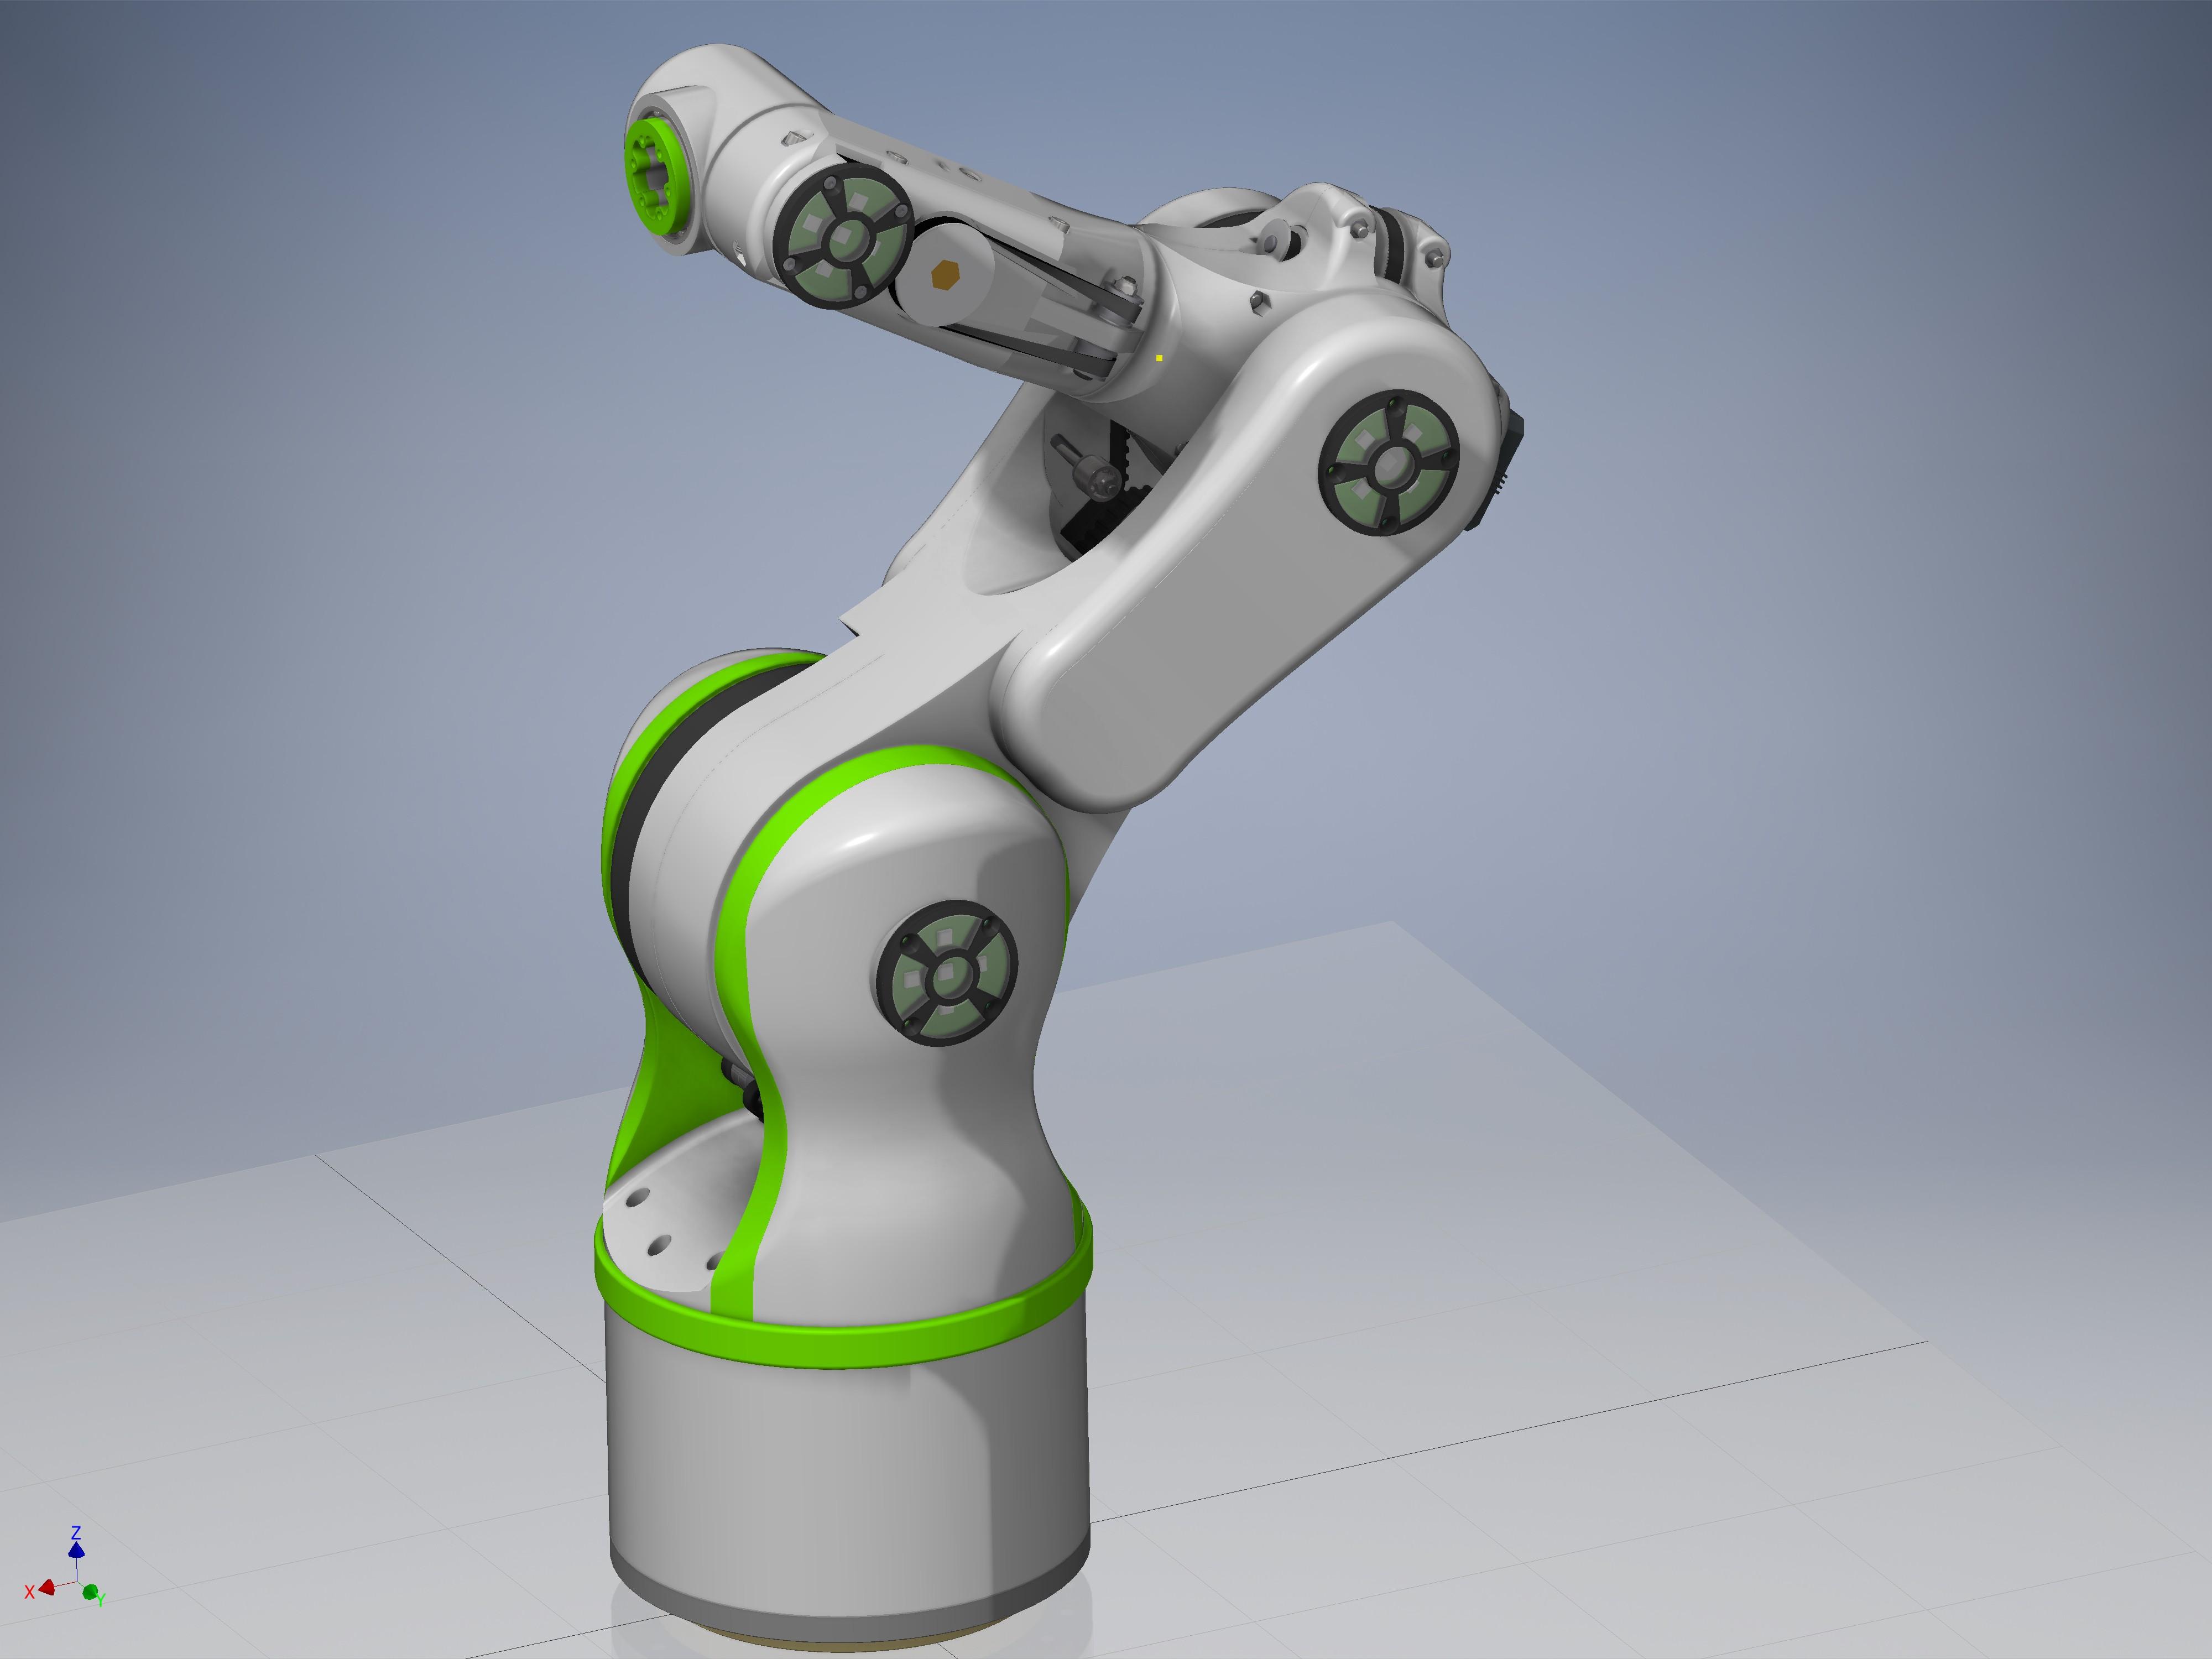 3D Printable Robot Arm | Hackaday io